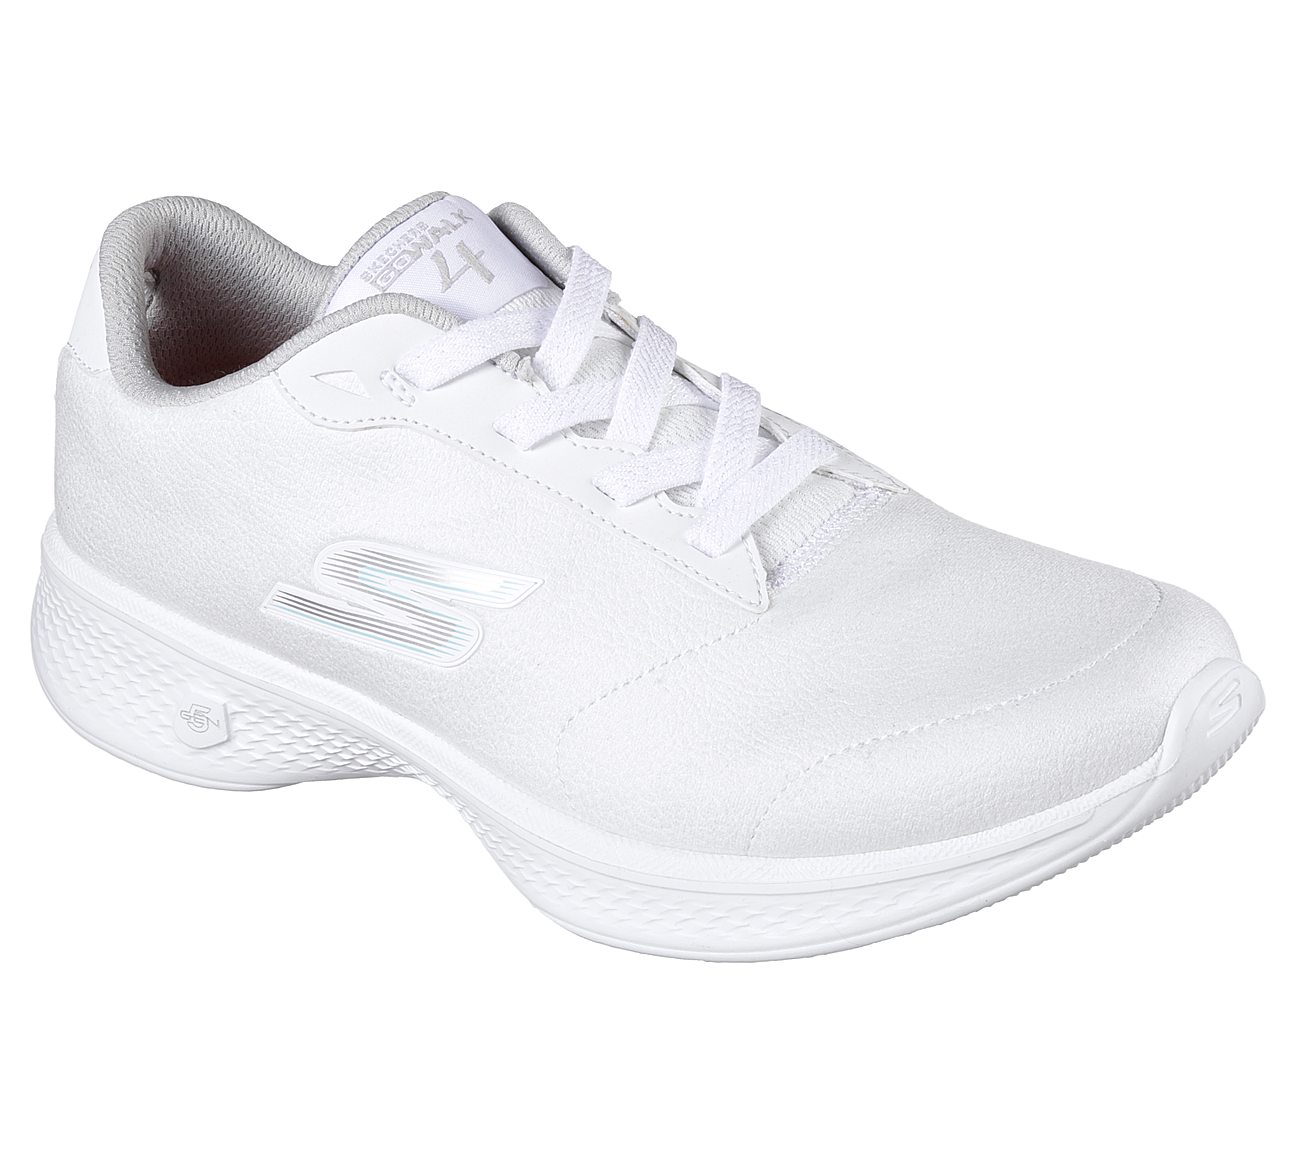 Calzado|Skechers|Hombre Skechers Gowalk 4 España